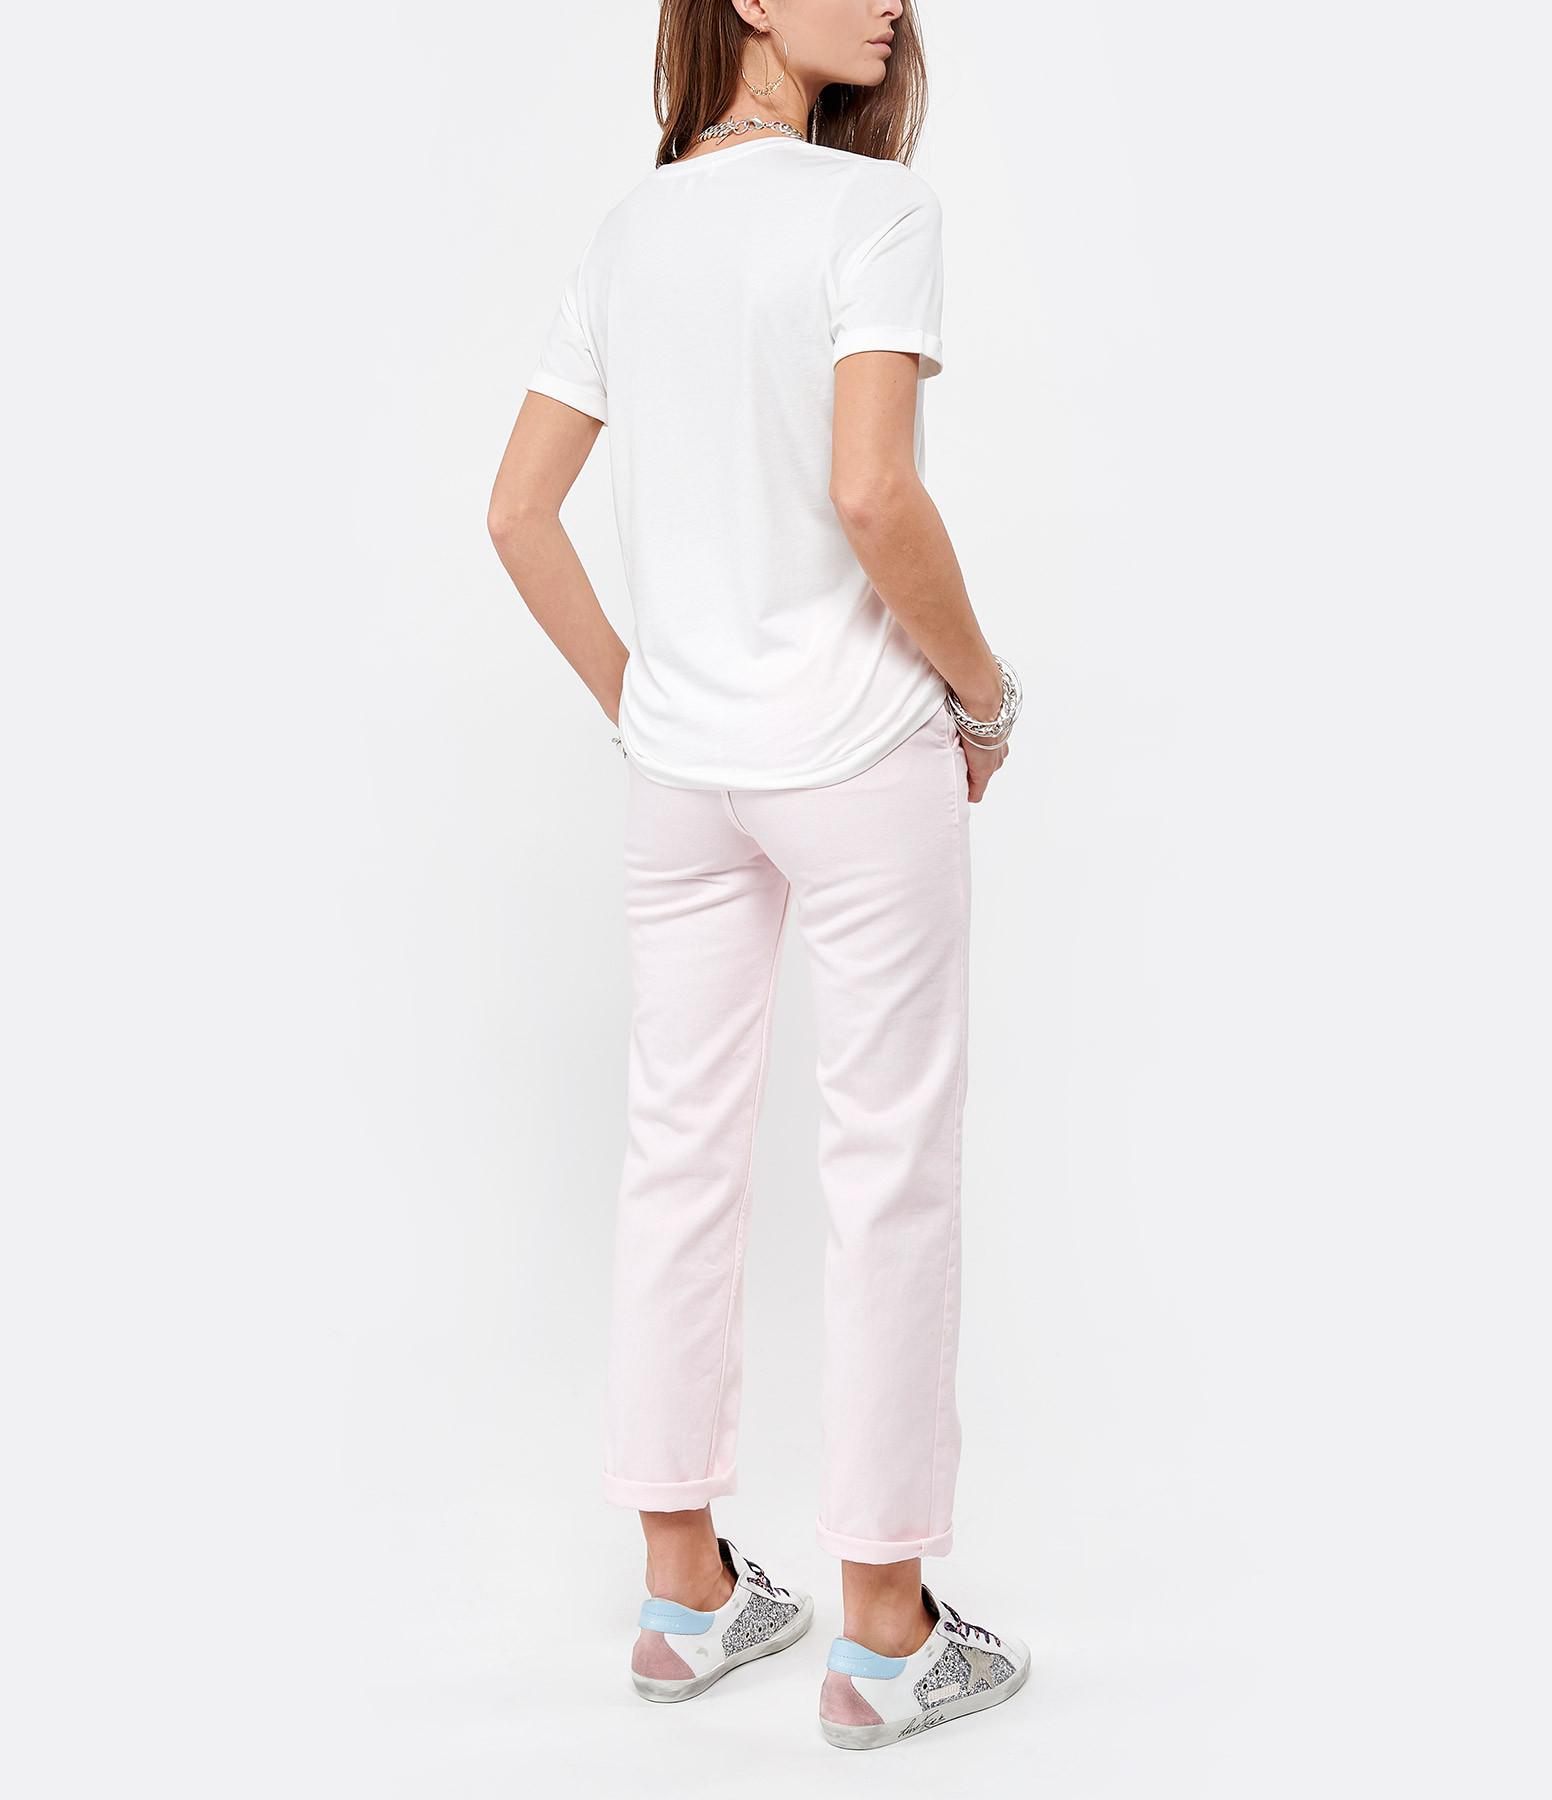 MAISON LABICHE - Tee-shirt Col V Cheers Coton Blanc